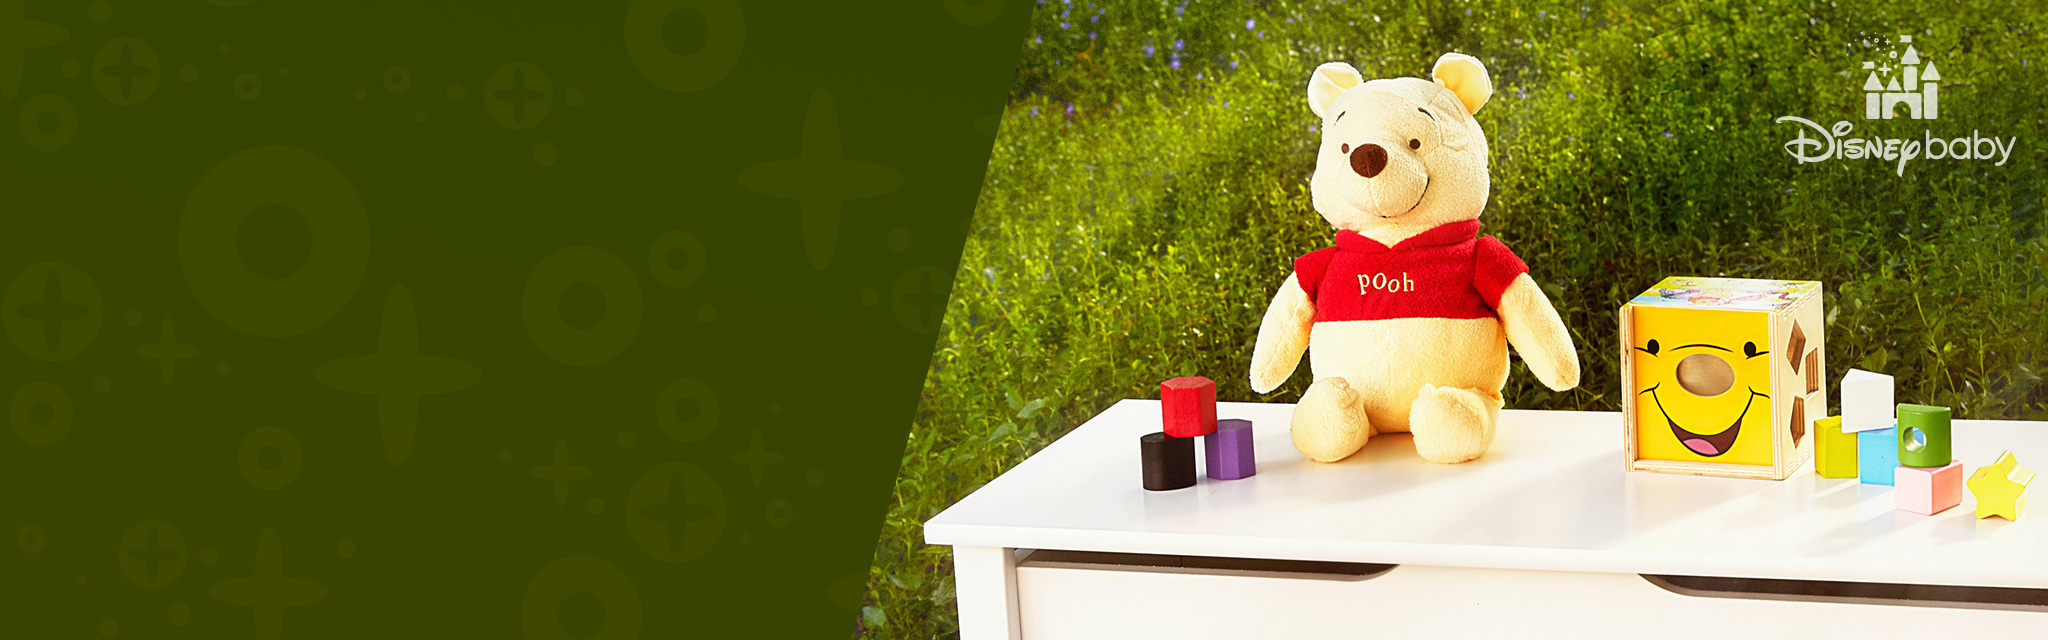 Winnie the Pooh - Disney Baby Summer - Hero